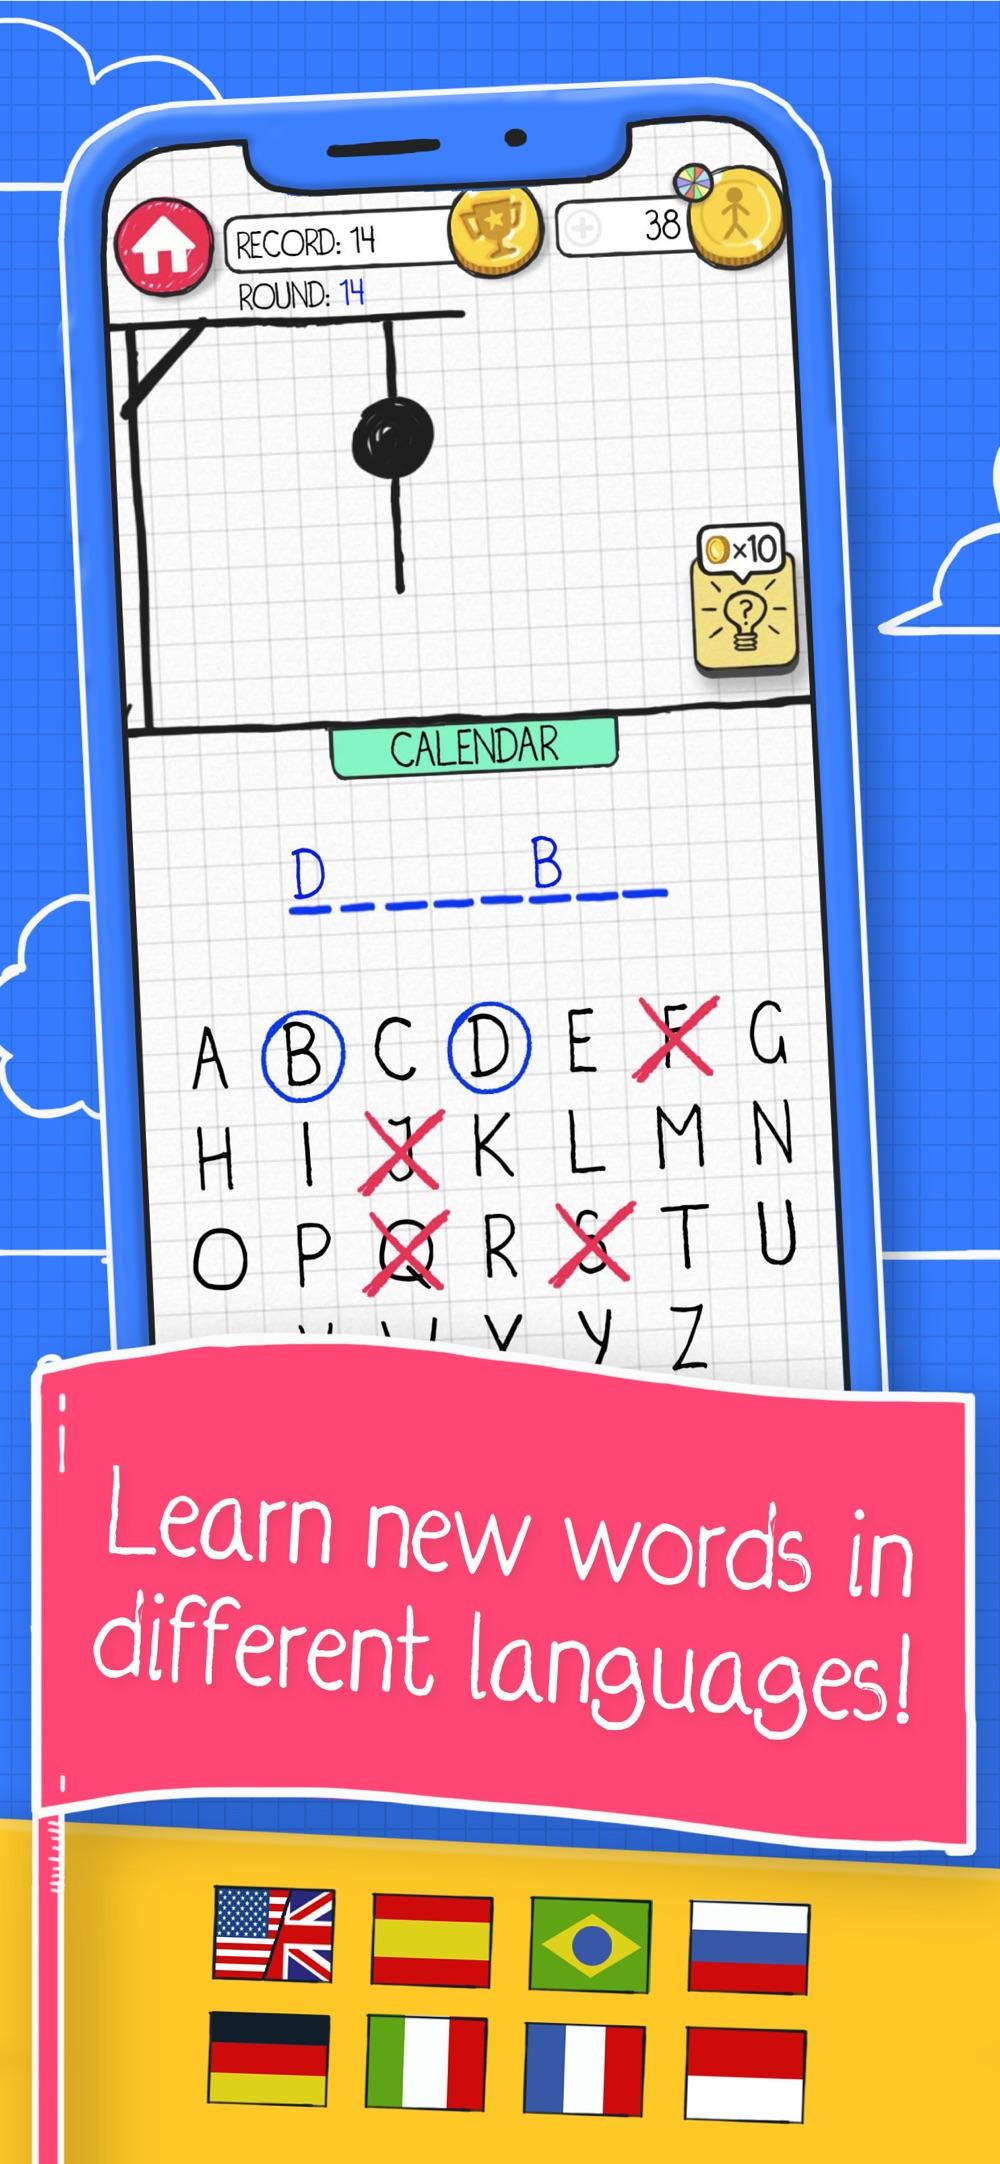 Hangman - Guess Words hack tool